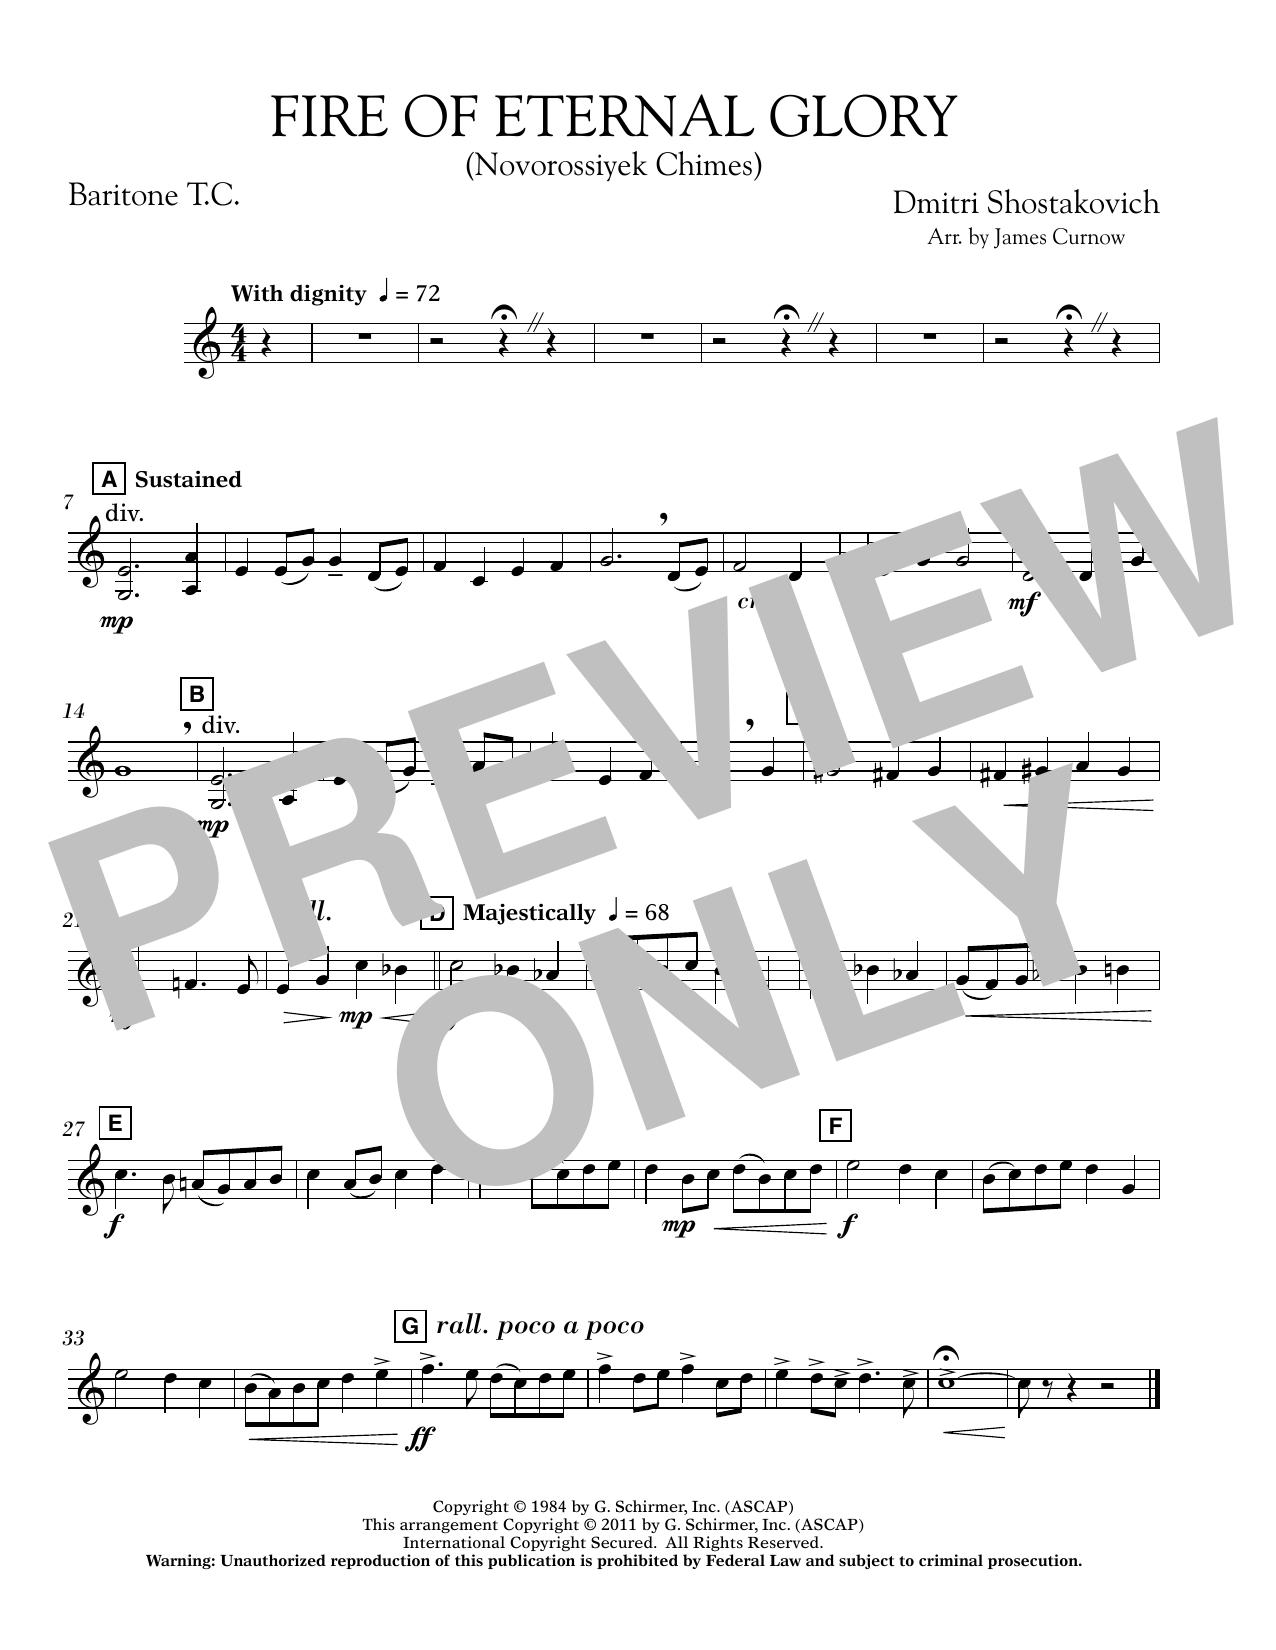 Fire of Eternal Glory (Novorossiyek Chimes) - Baritone T.C. (Concert Band)